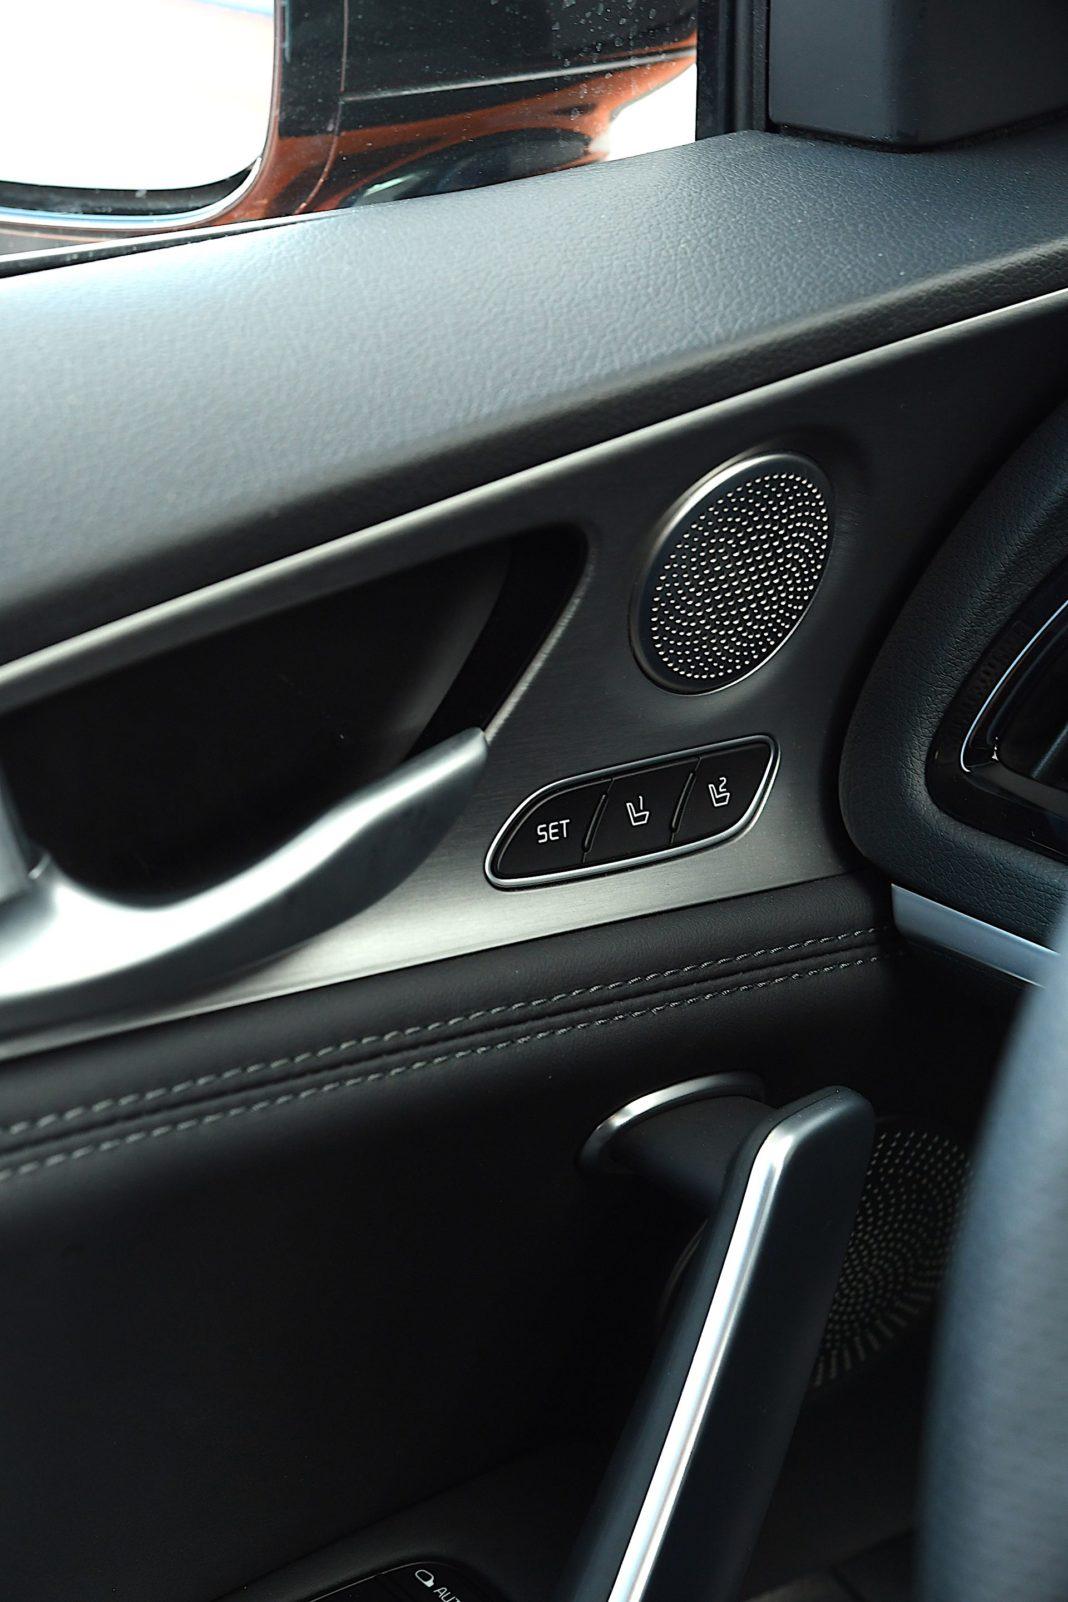 Kia Stinger 3.3 V6 GT - przyciski